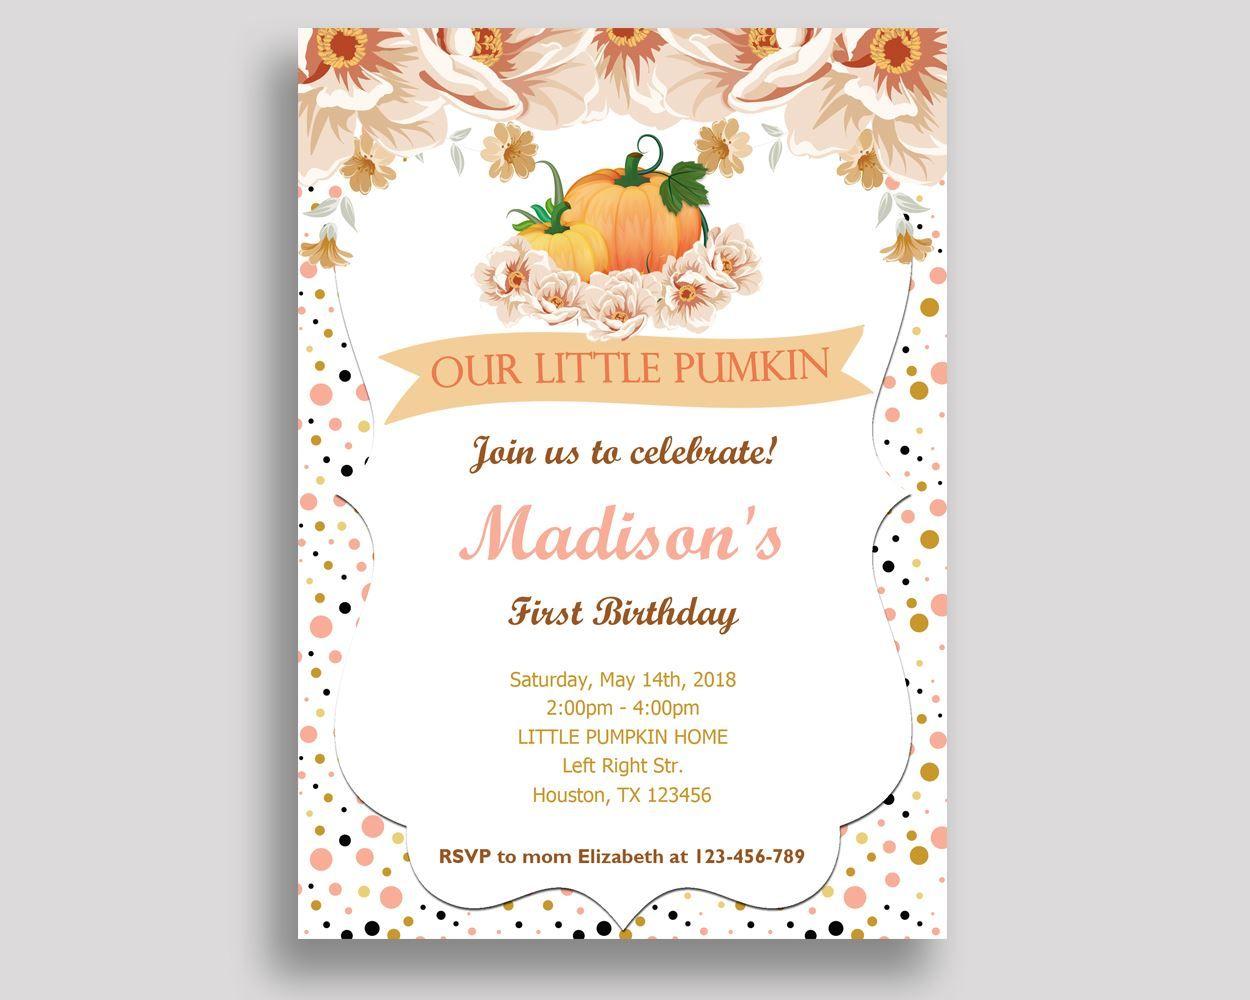 Pumpkin Birthday Invitation Pumpkin Birthday Party Invitation ...